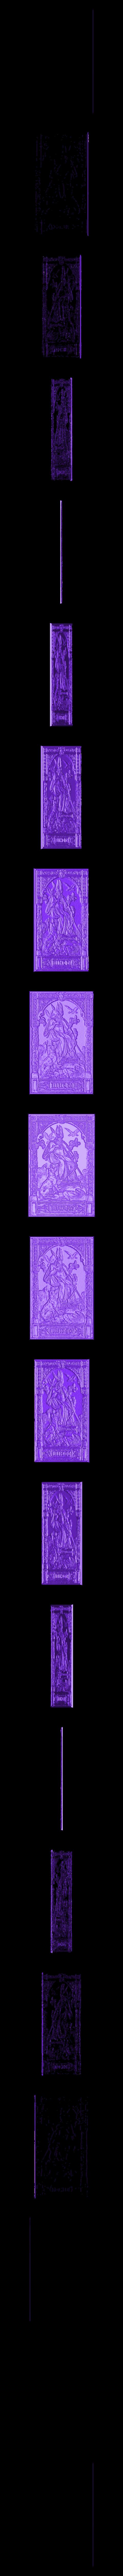 odin.stl Download free STL file odin wotan odino norse god • Design to 3D print, marctull297